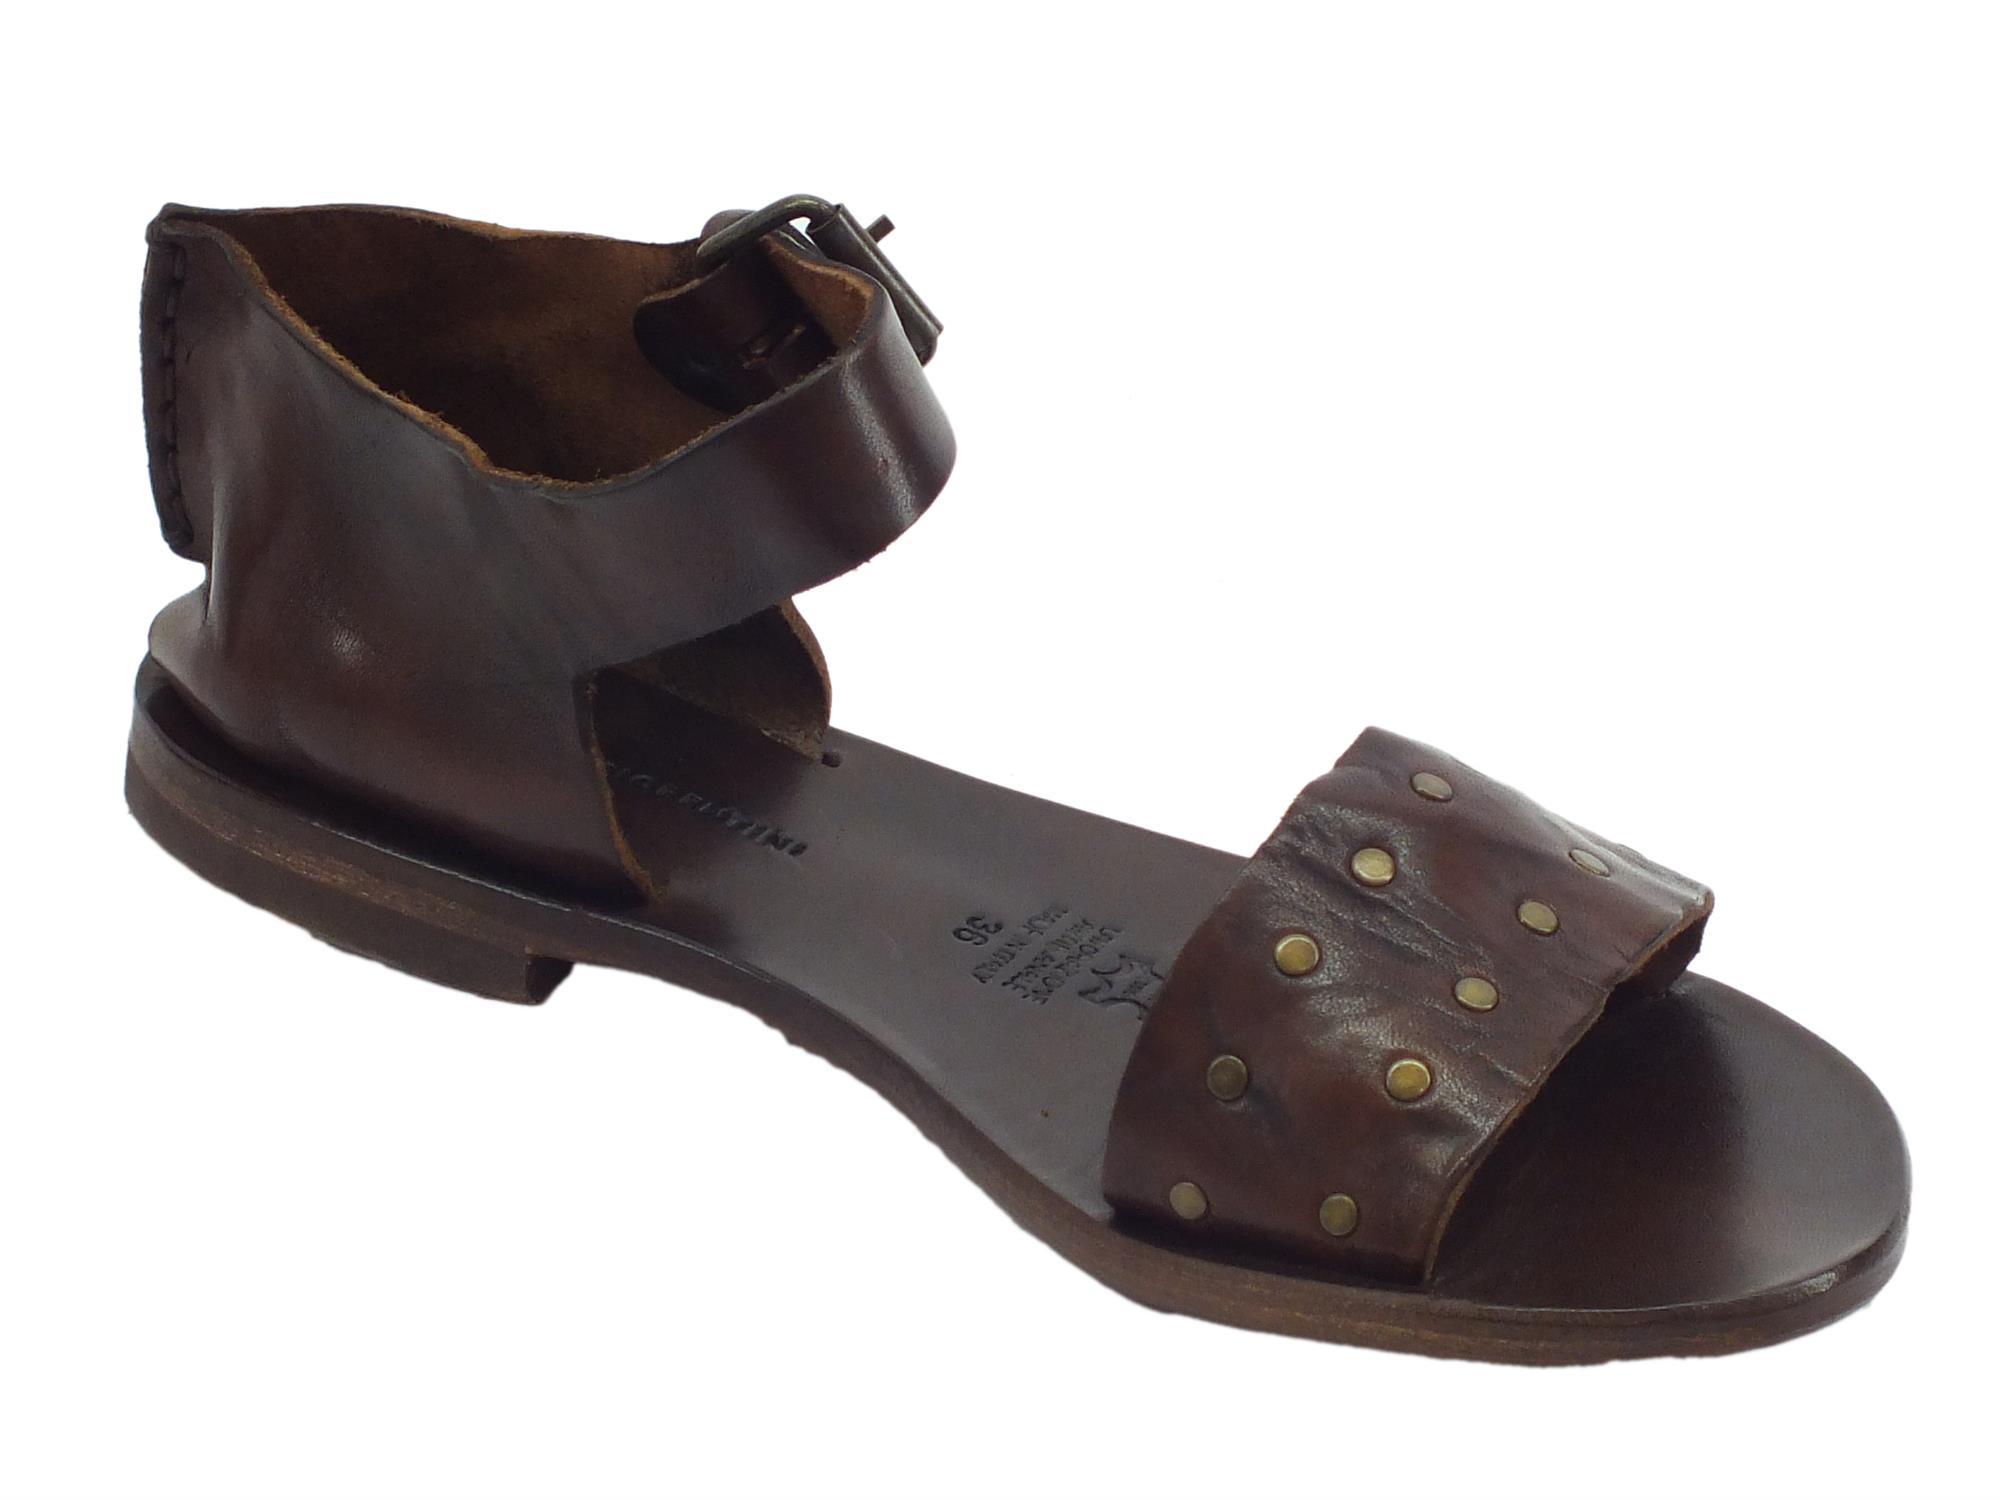 ... Sandali per donna Mercanti Fiorentini in pelle tuffata mogano  artigianali ... ce7b2516708